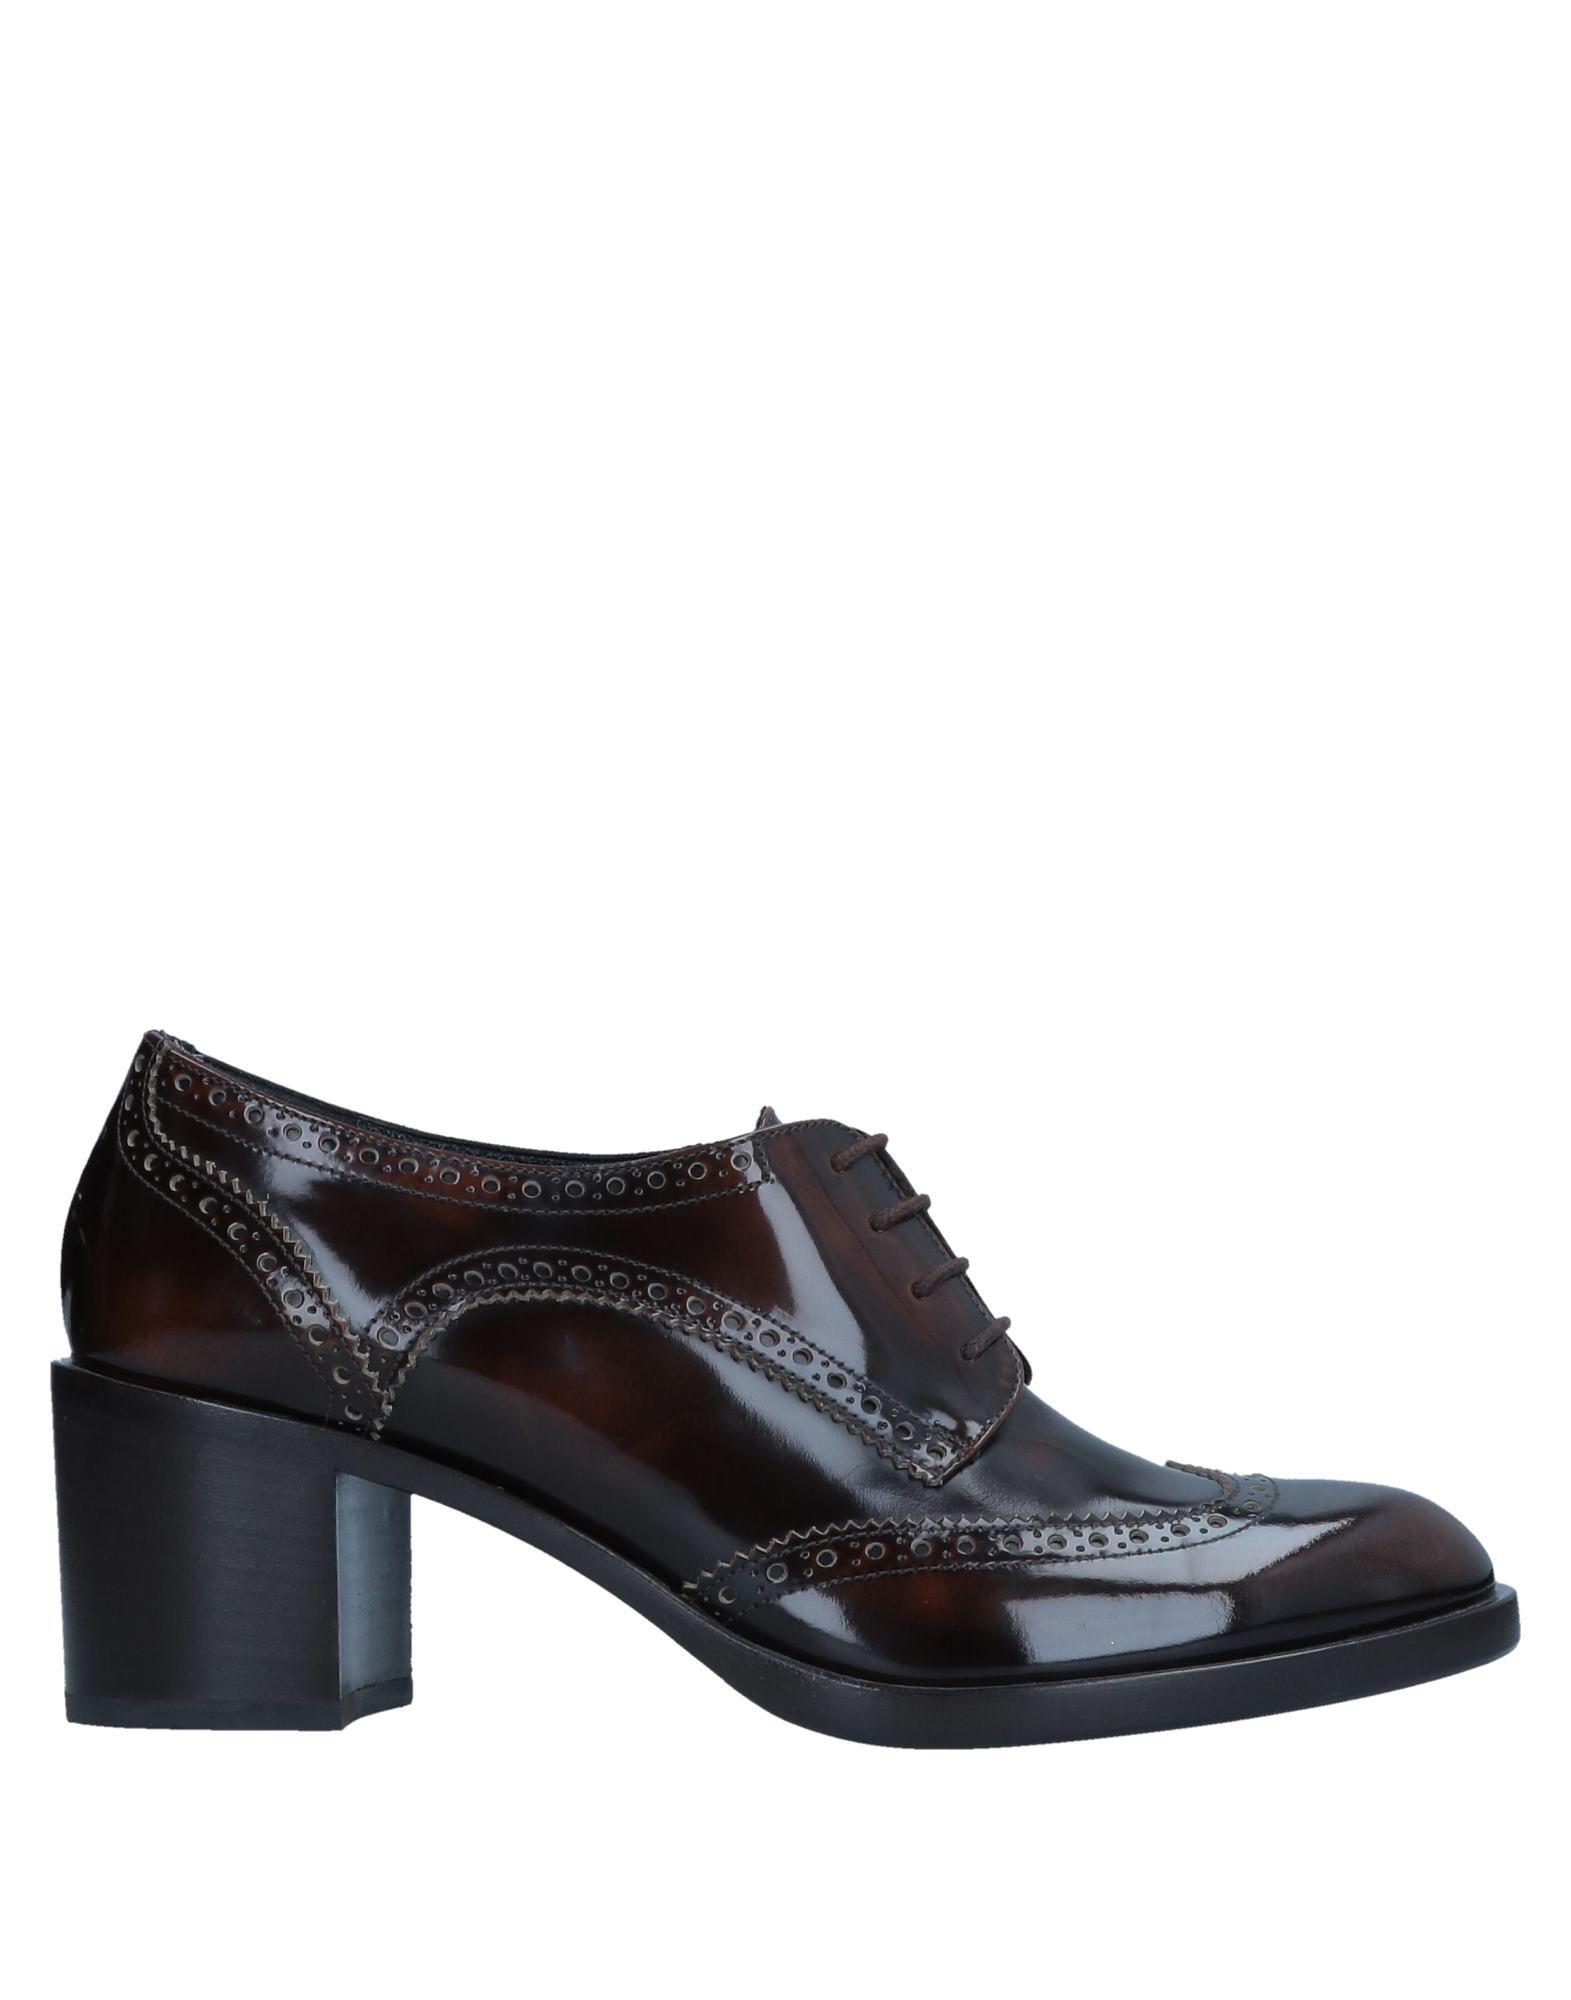 FRATELLI ROSSETTI | FRATELLI ROSSETTI Lace-up shoes 11558127 | Goxip